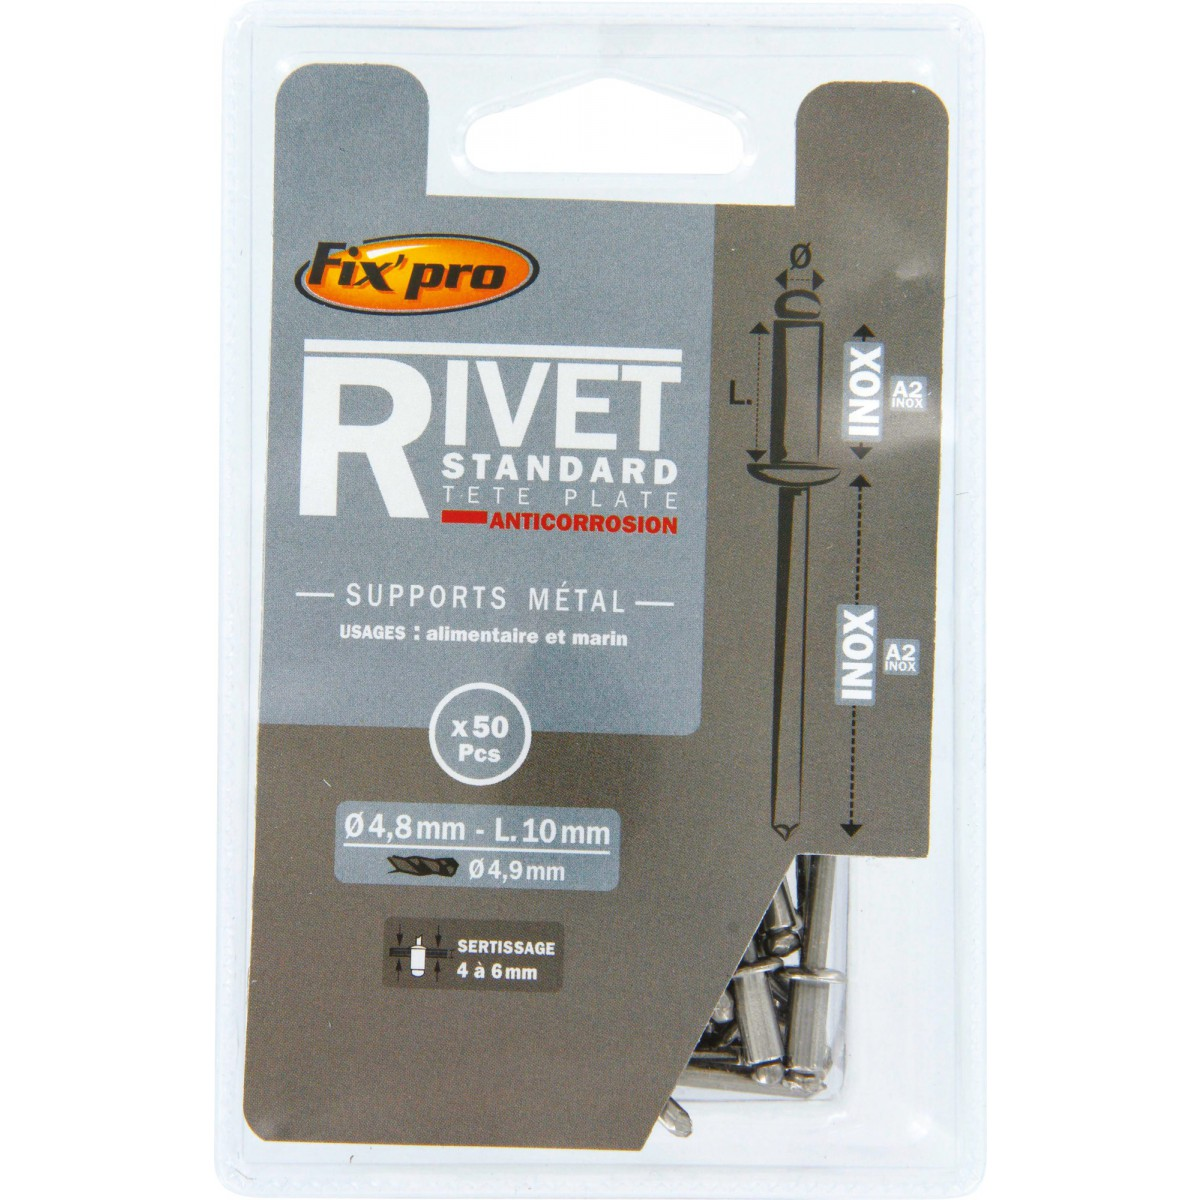 Rivet aveugle tête plate inox / inox A2 Fix'Pro - Longueur 10 mm - Diamètre 4,8 mm - Vendu par 50